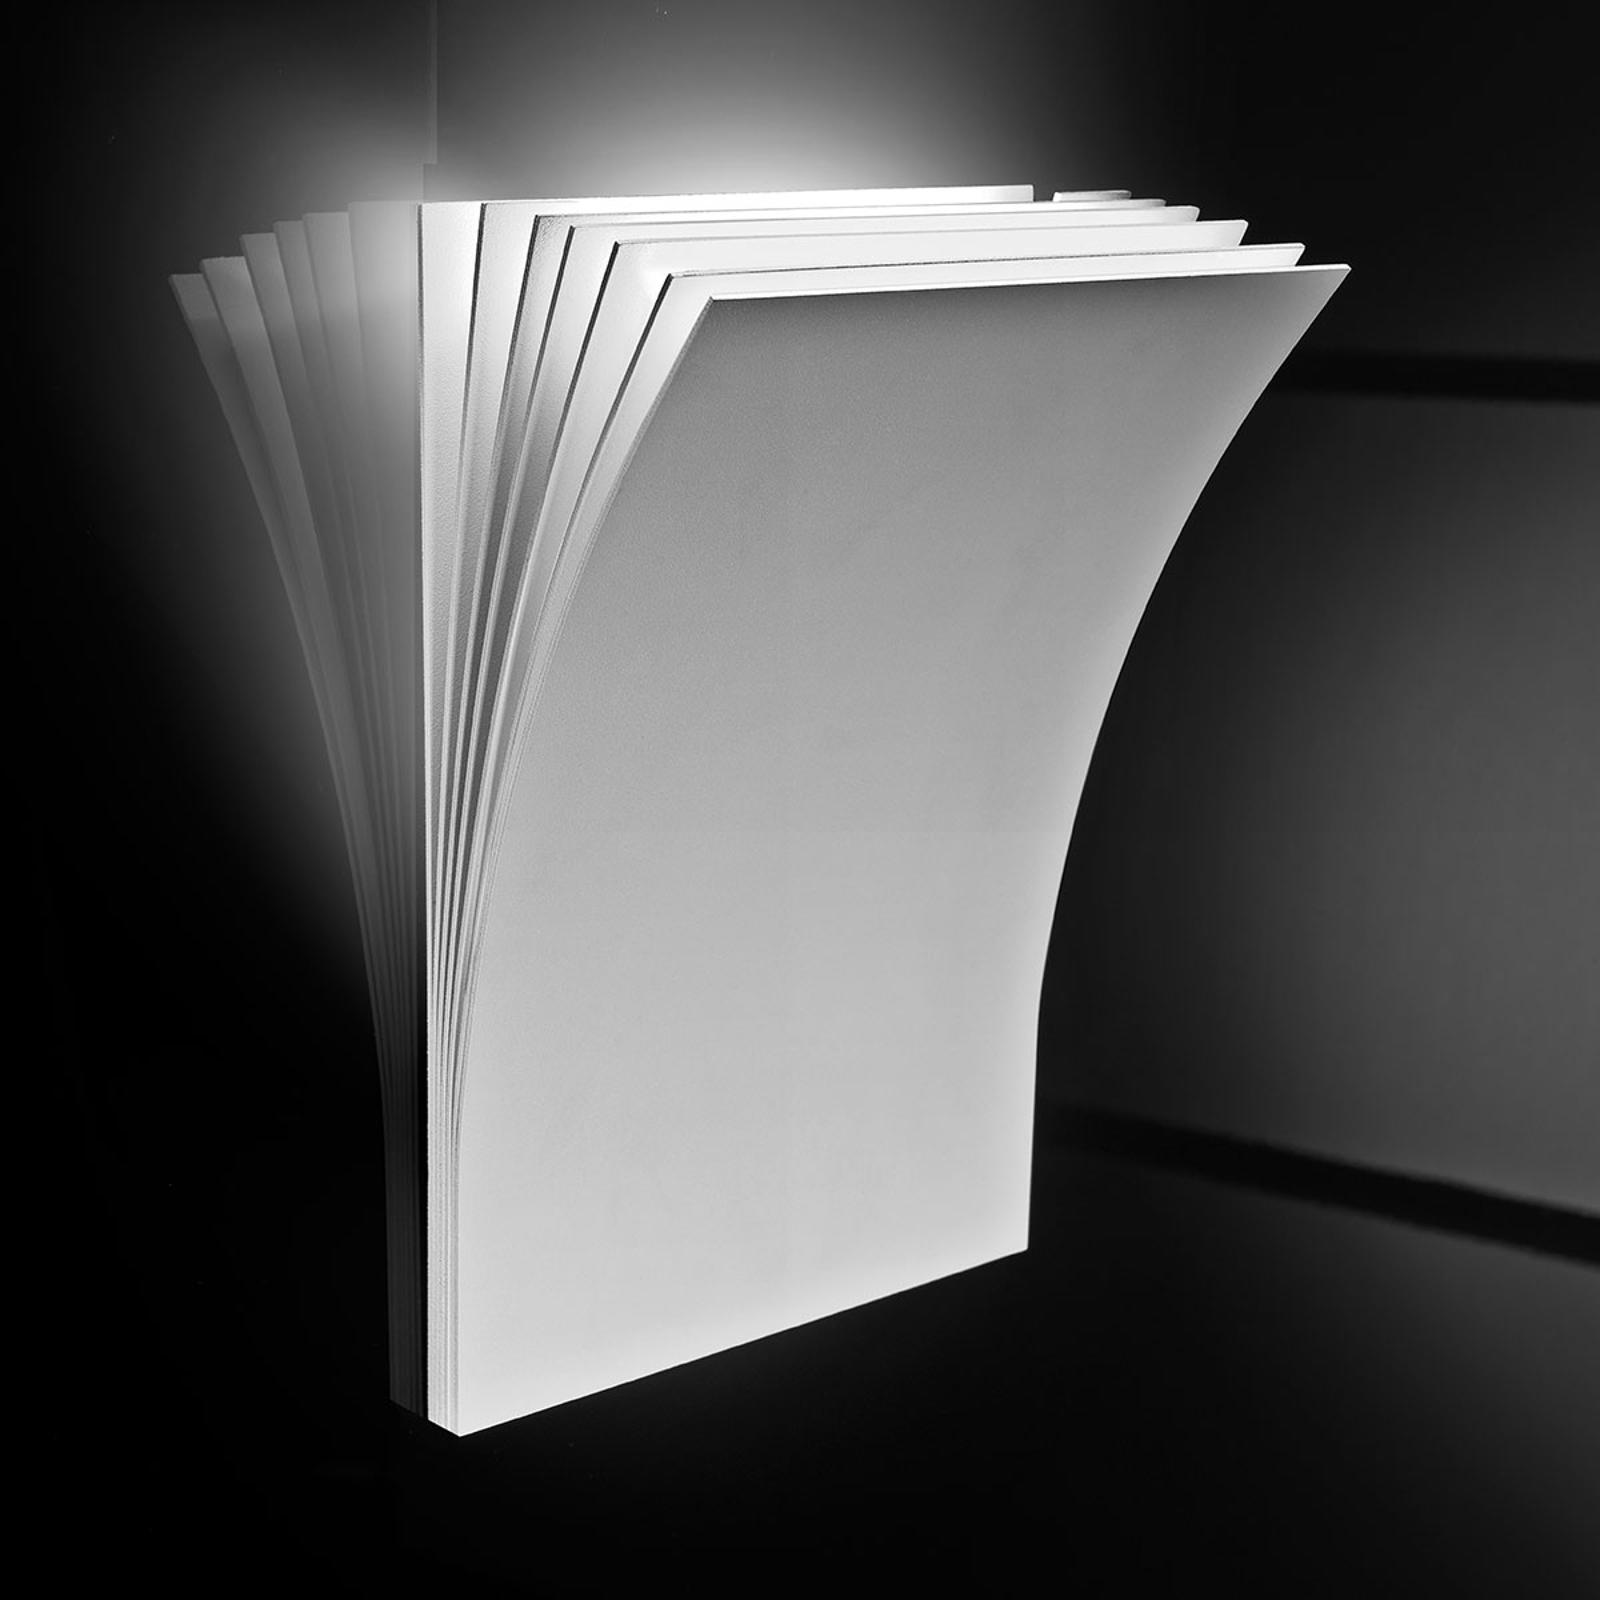 Axolight Polia LED-Wandleuchte in Weiß 19cm